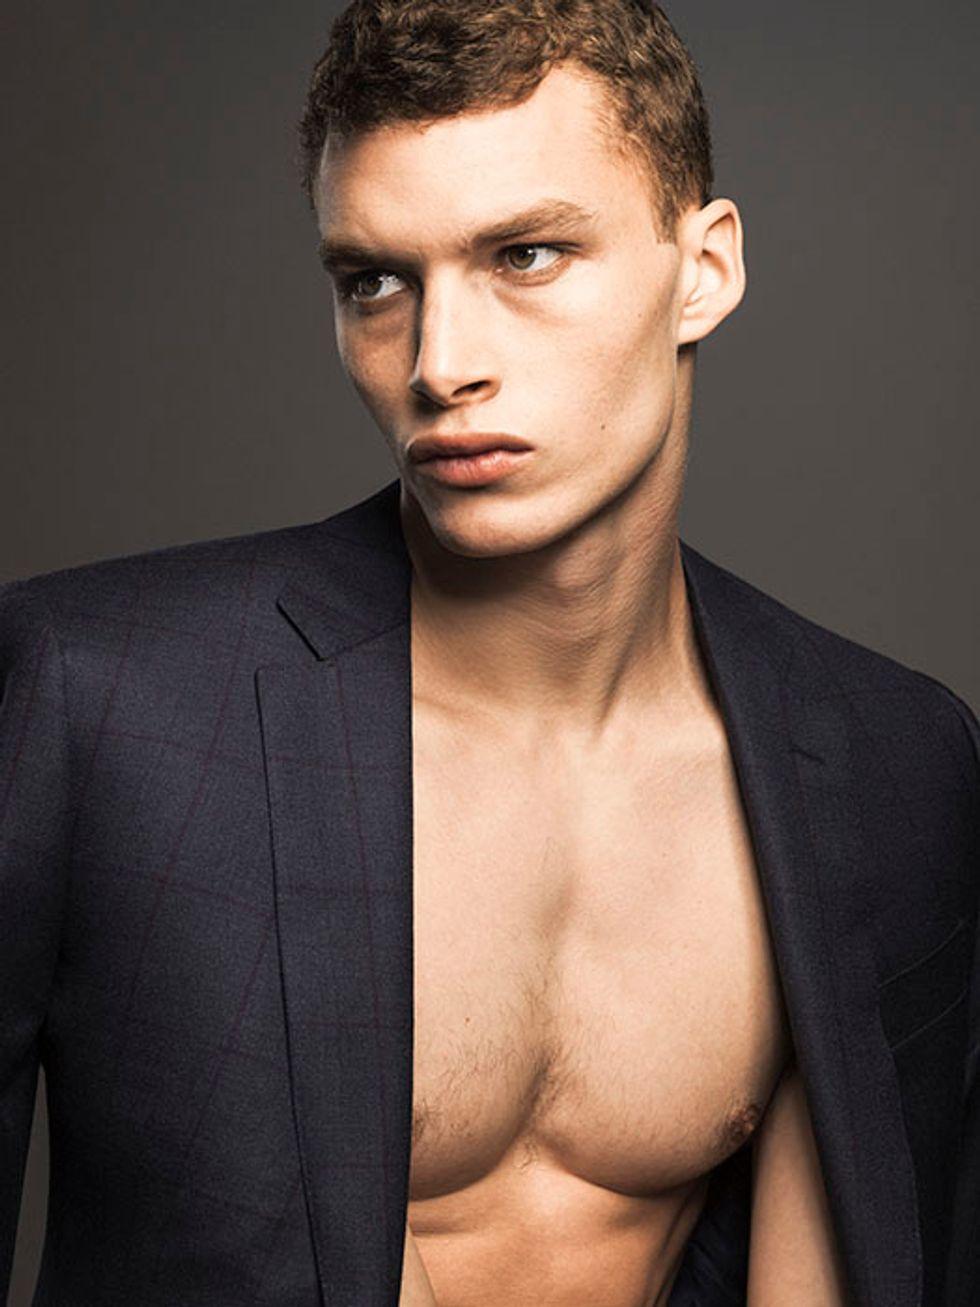 Model Crush Mondays: Louis Mayhew